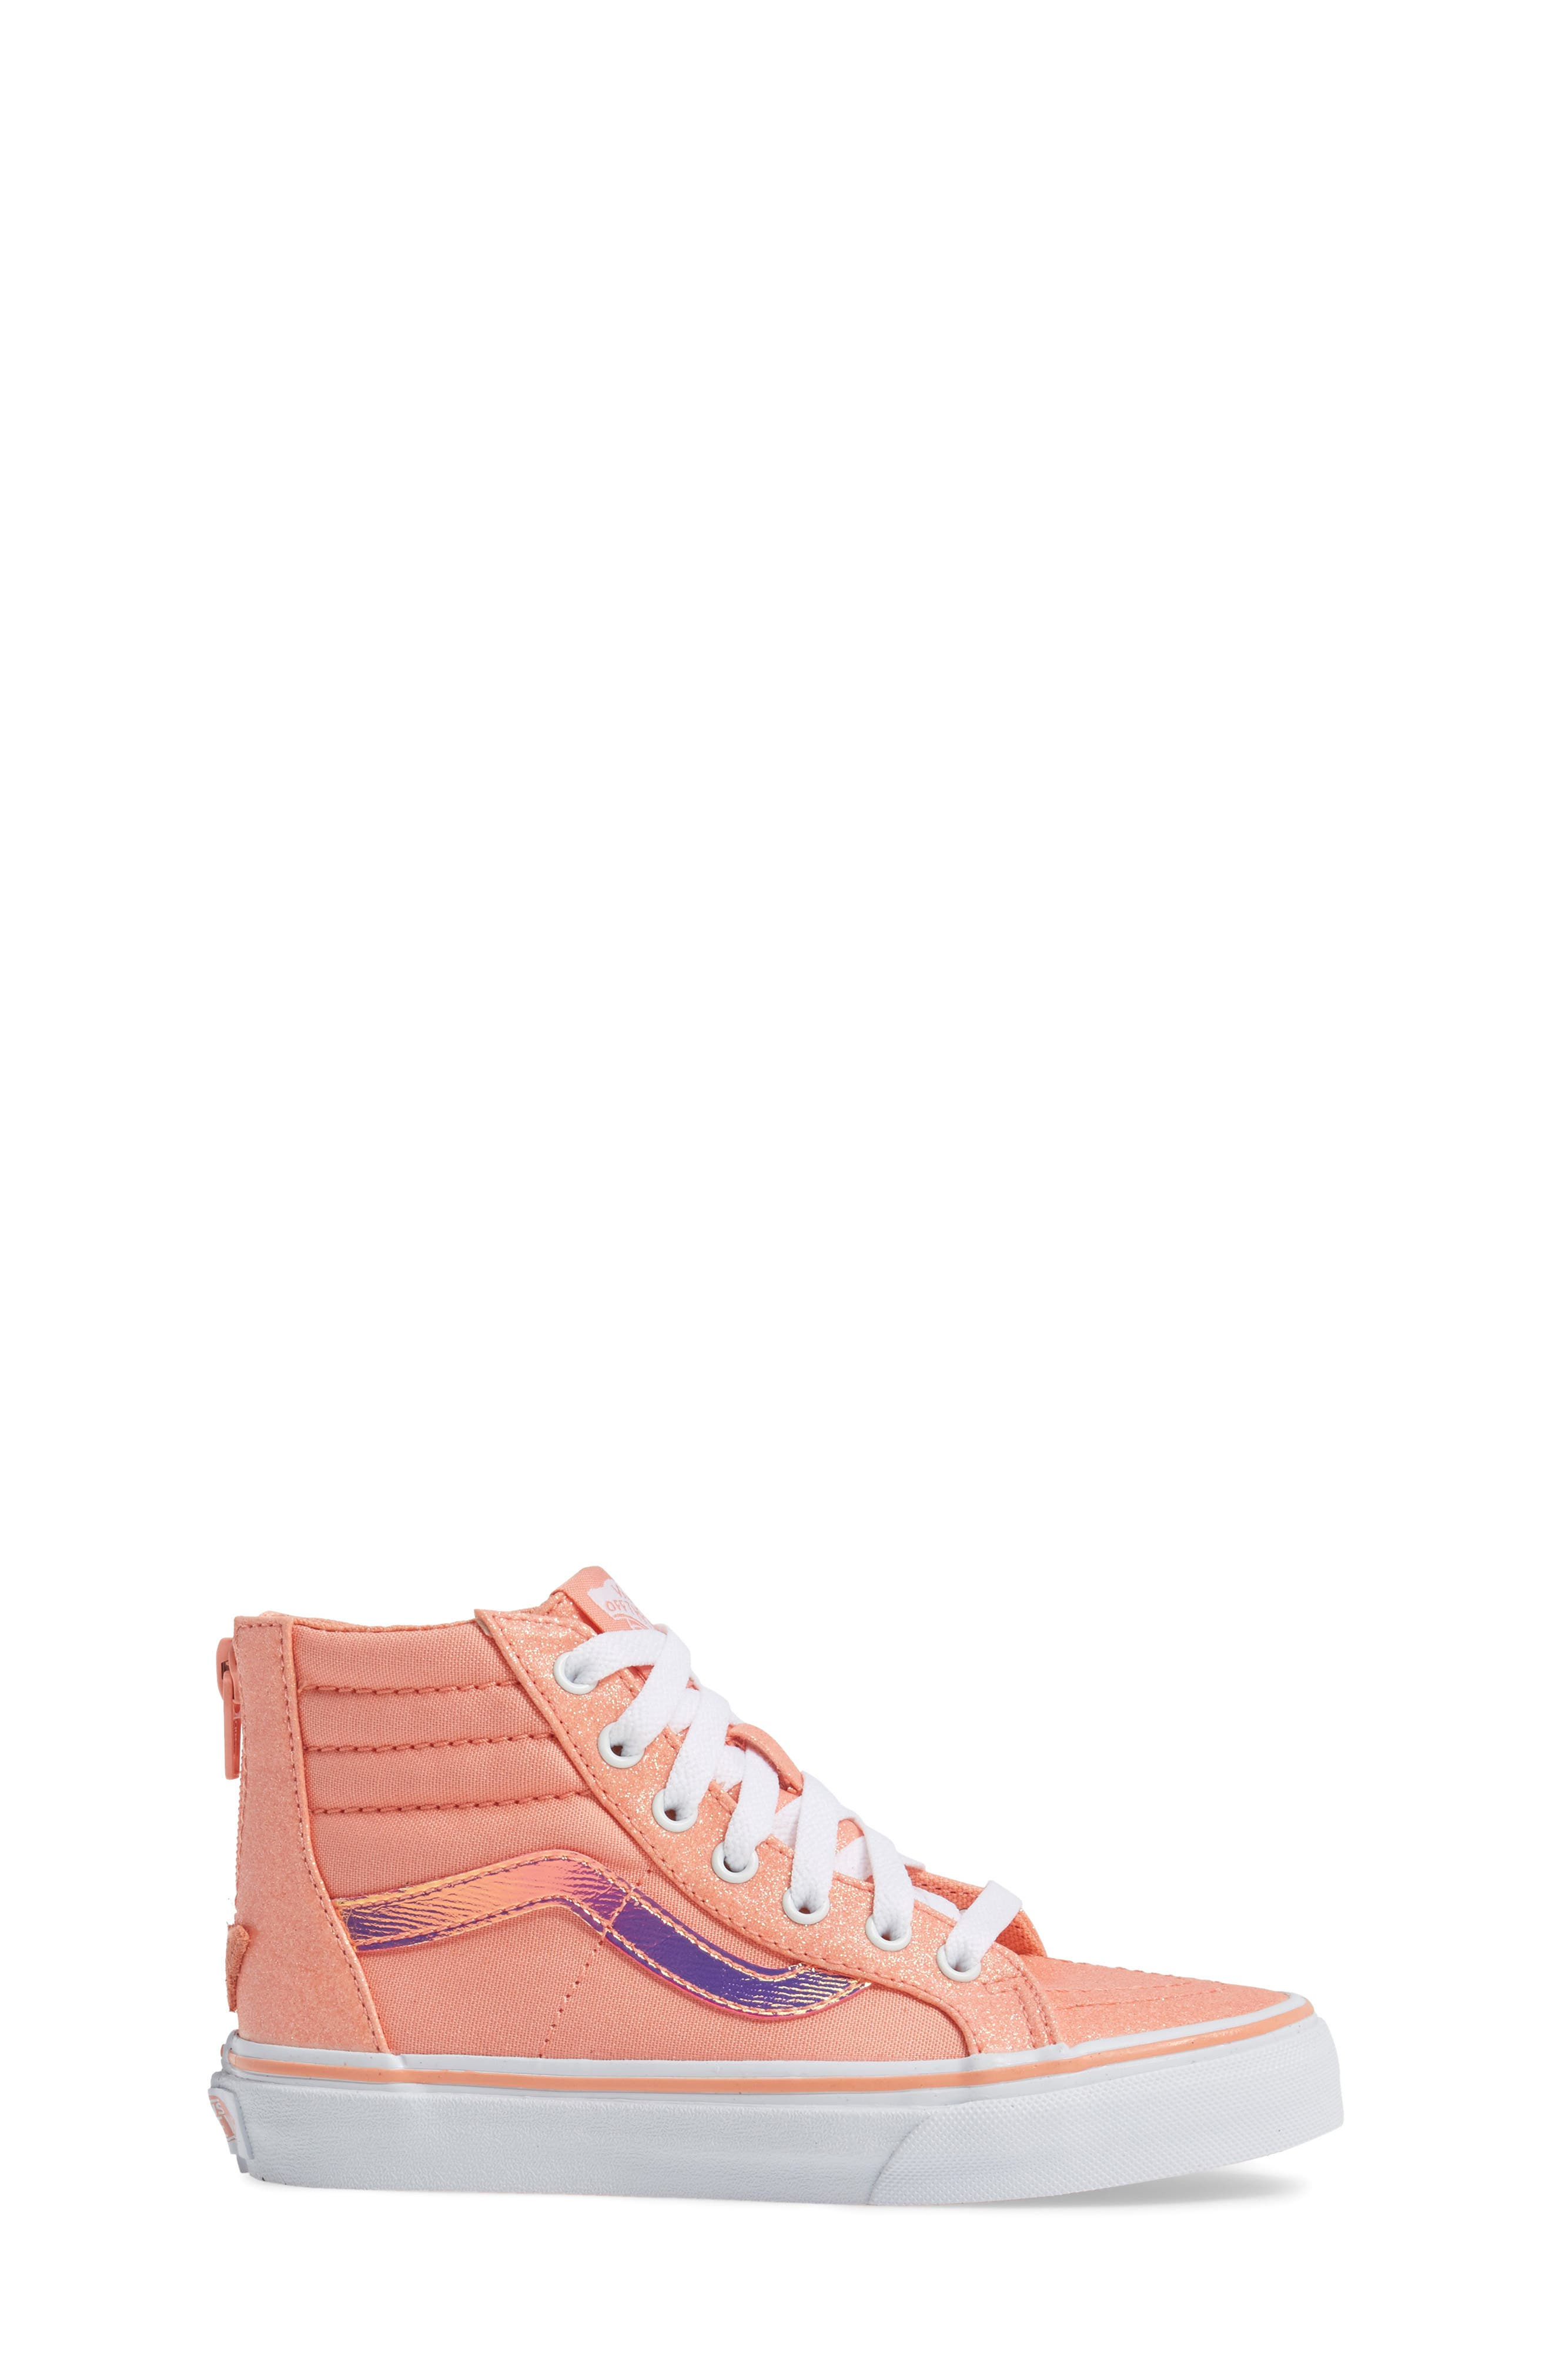 Sk8-Hi Zip Sneaker,                             Alternate thumbnail 3, color,                             Coral Glitter/ Iridescent